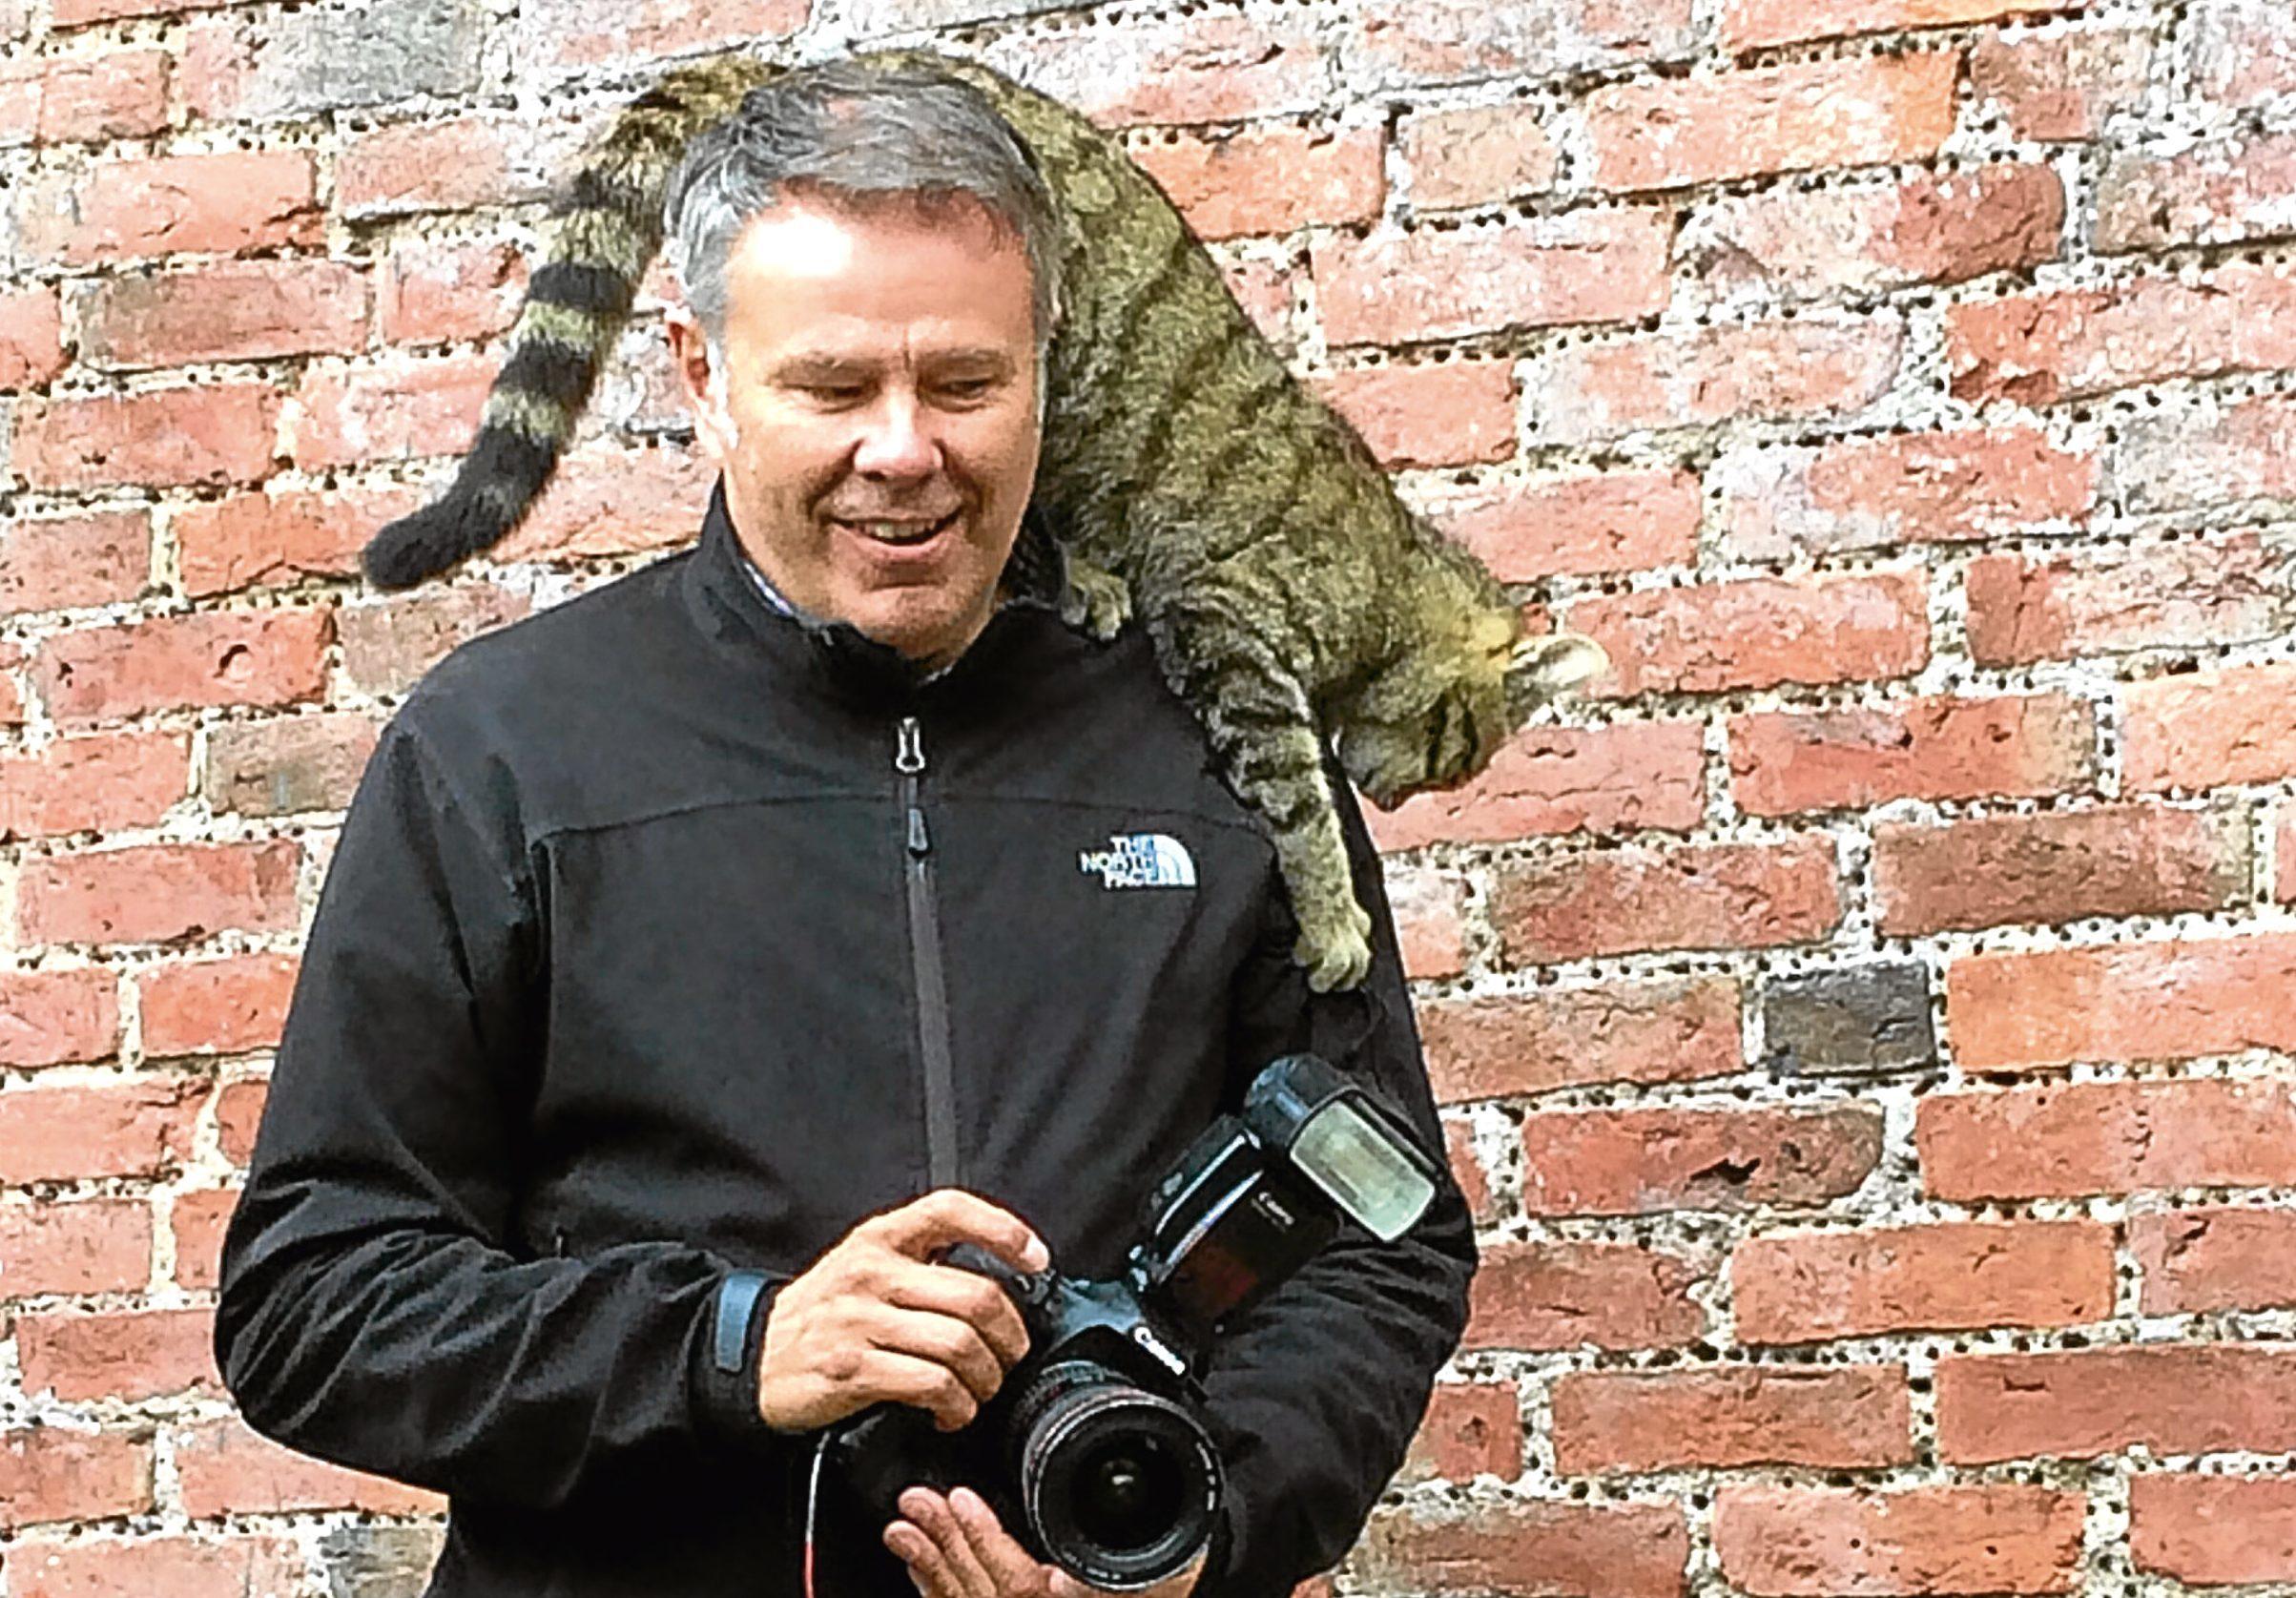 Pipet meets photographer Gareth Jennings